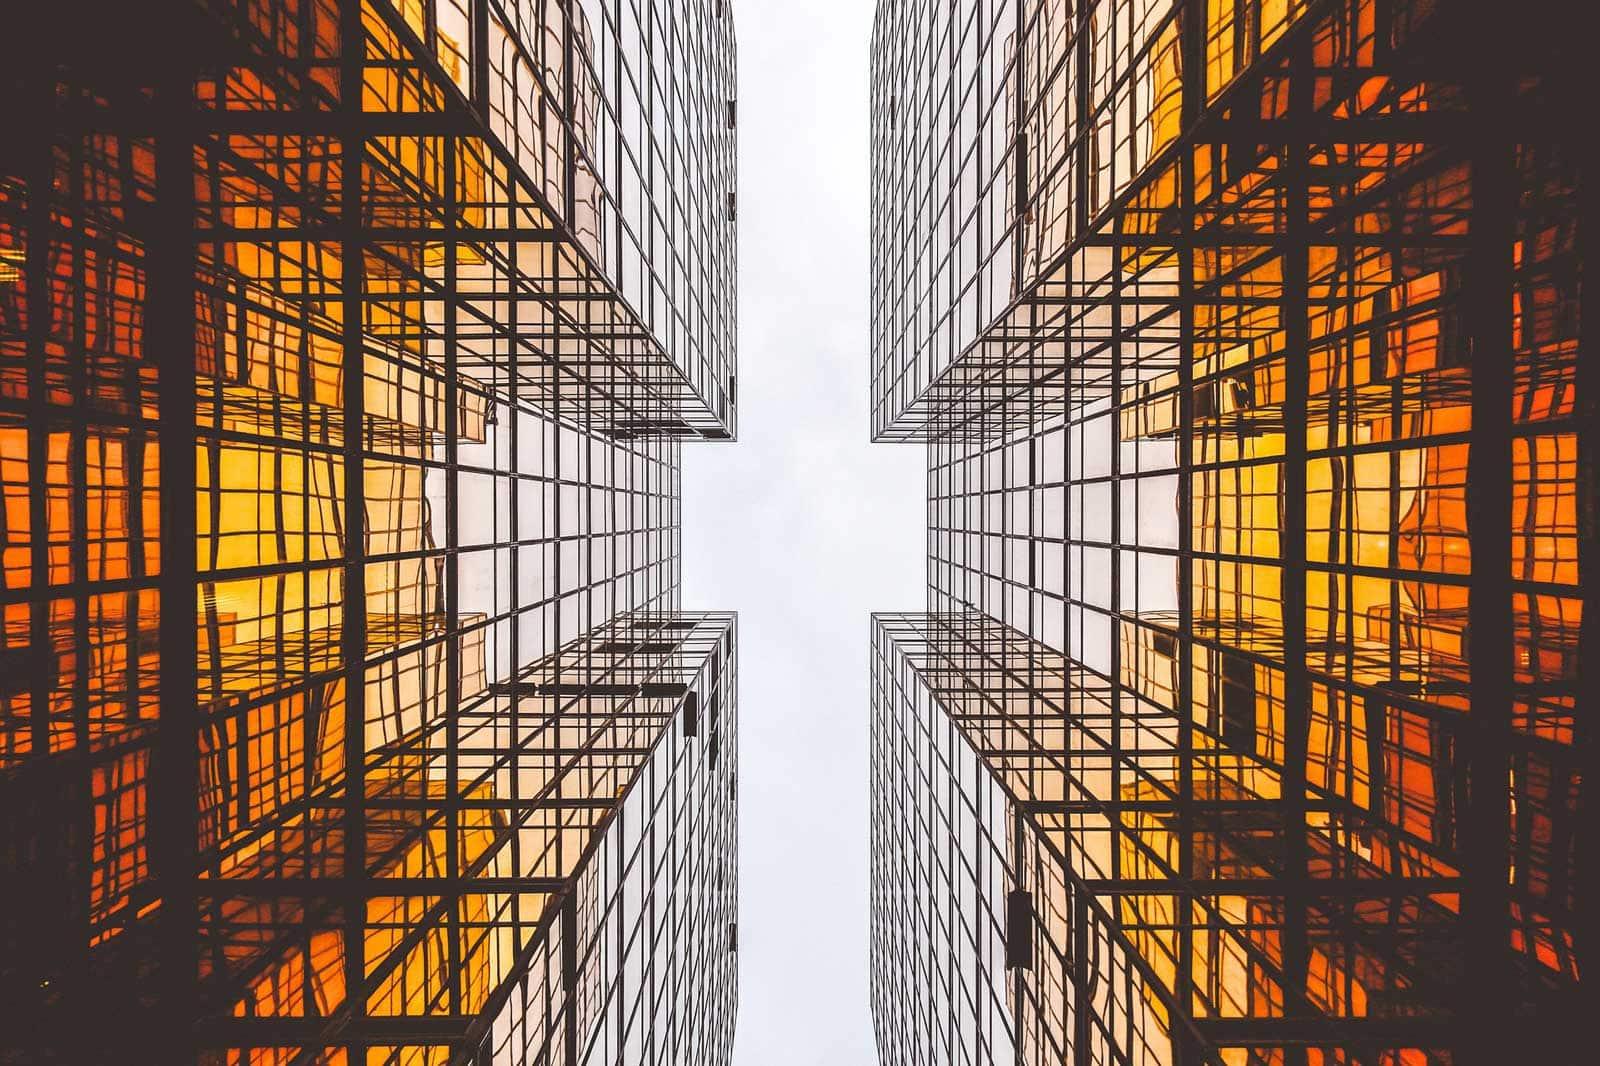 Architektur Wolkenkratzer Utopie Utopia Planet